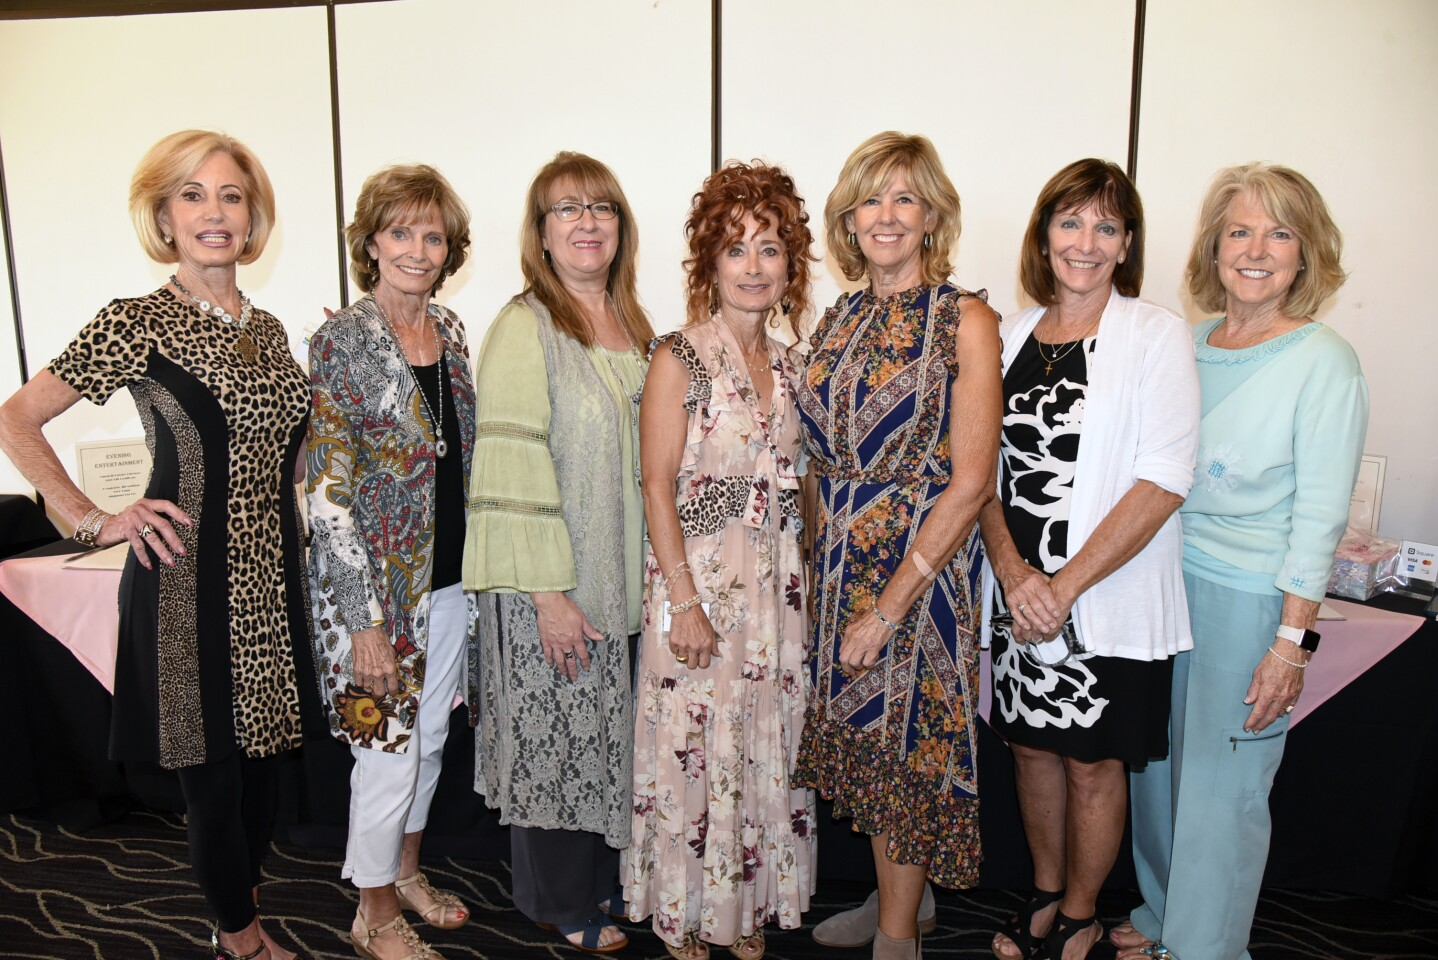 Board members Jan Reital (Program Chair), Pat Van Gorder, Barbara Litwiller, Amber Persia-Hodges, Board Chair Jill Mulligan, Stephanie Messina, Susan Popov